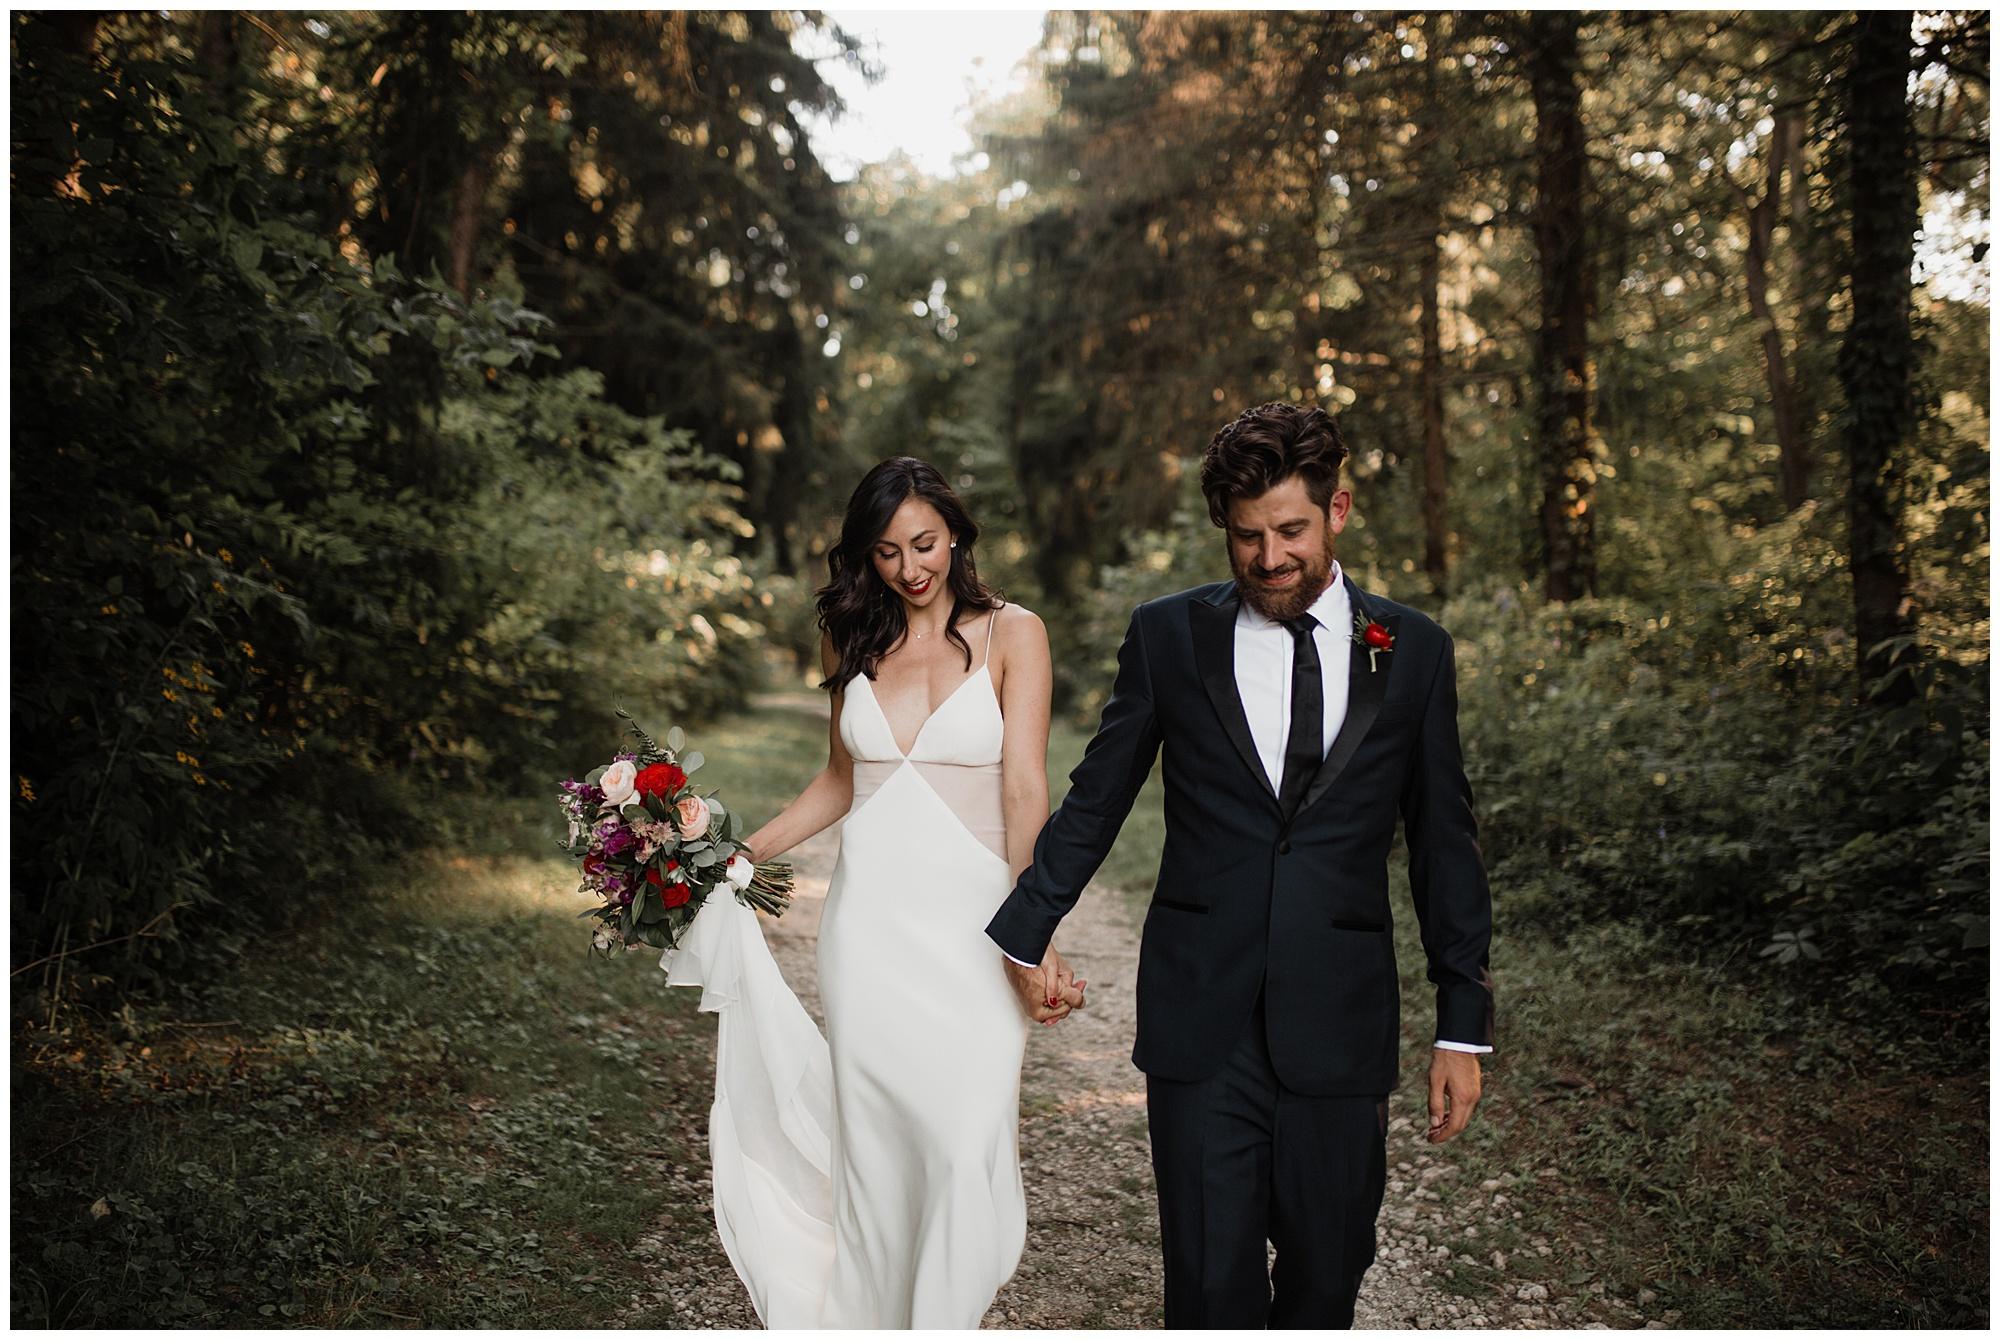 allerton_park_wedding_champaign_il_chicago_wright_photographs_ne_0095.jpg